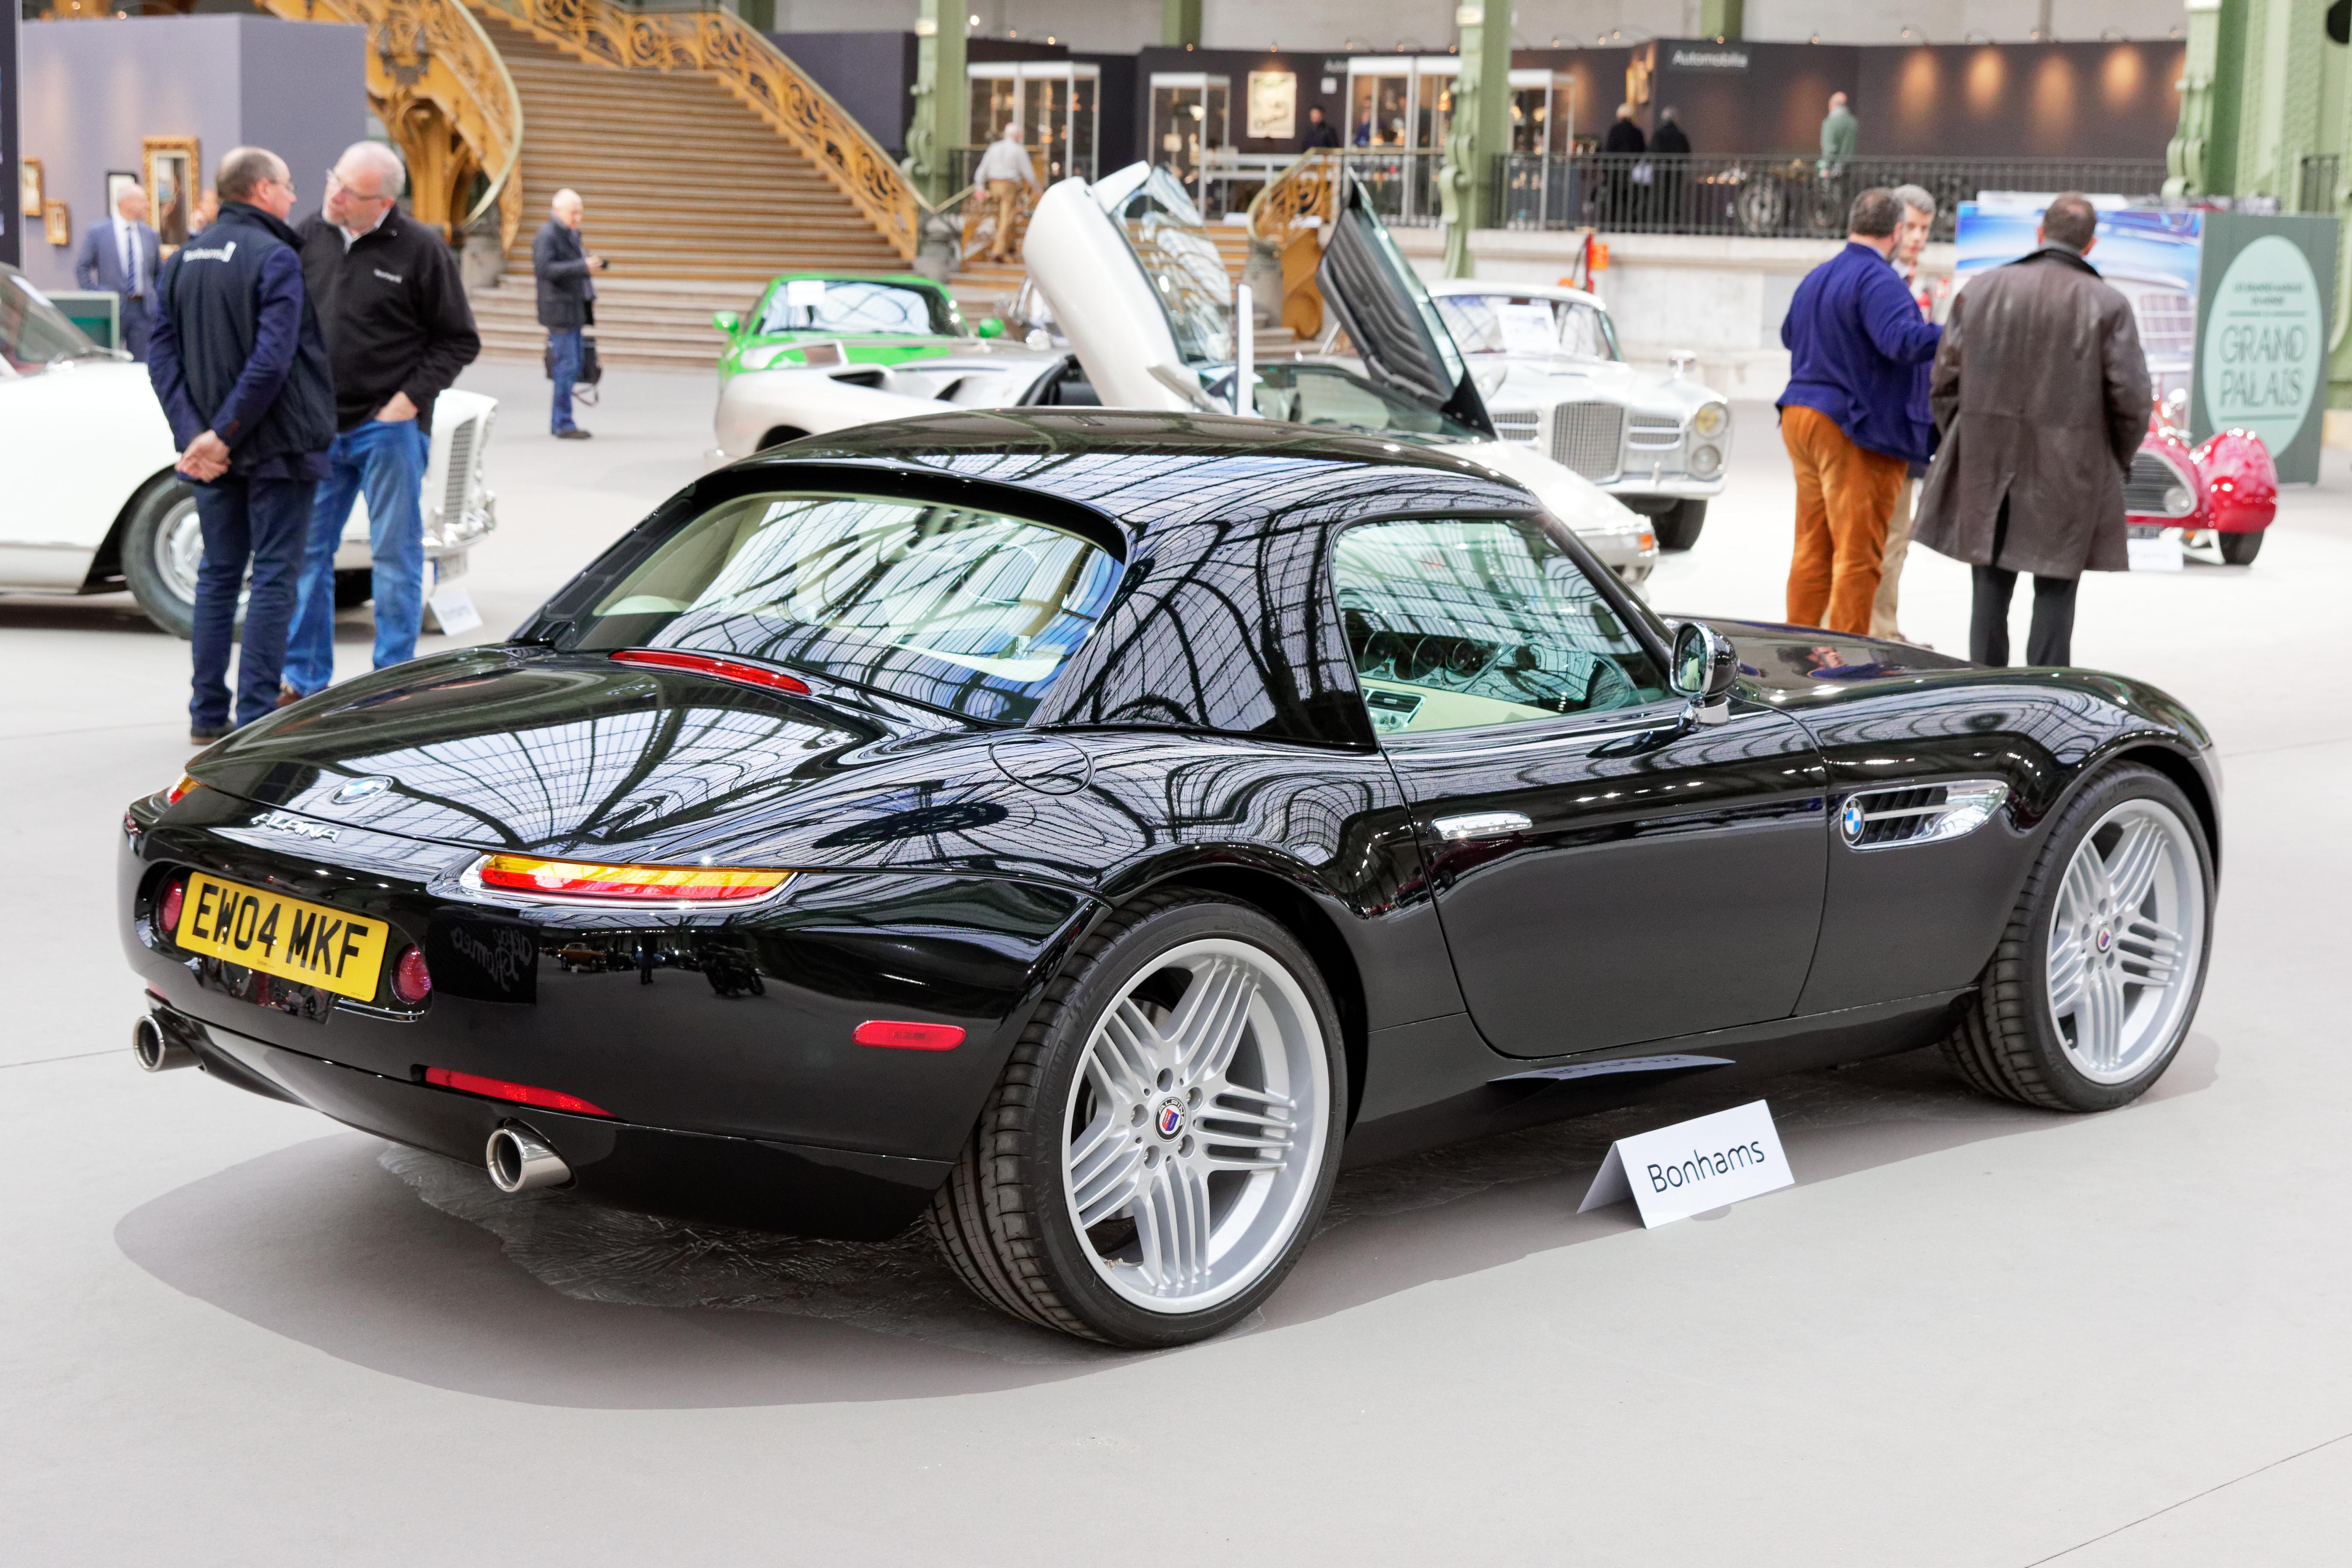 BMW Z8 Alpina >> File Paris Bonhams 2017 Bmw Z8 Alpina V8 Roadster